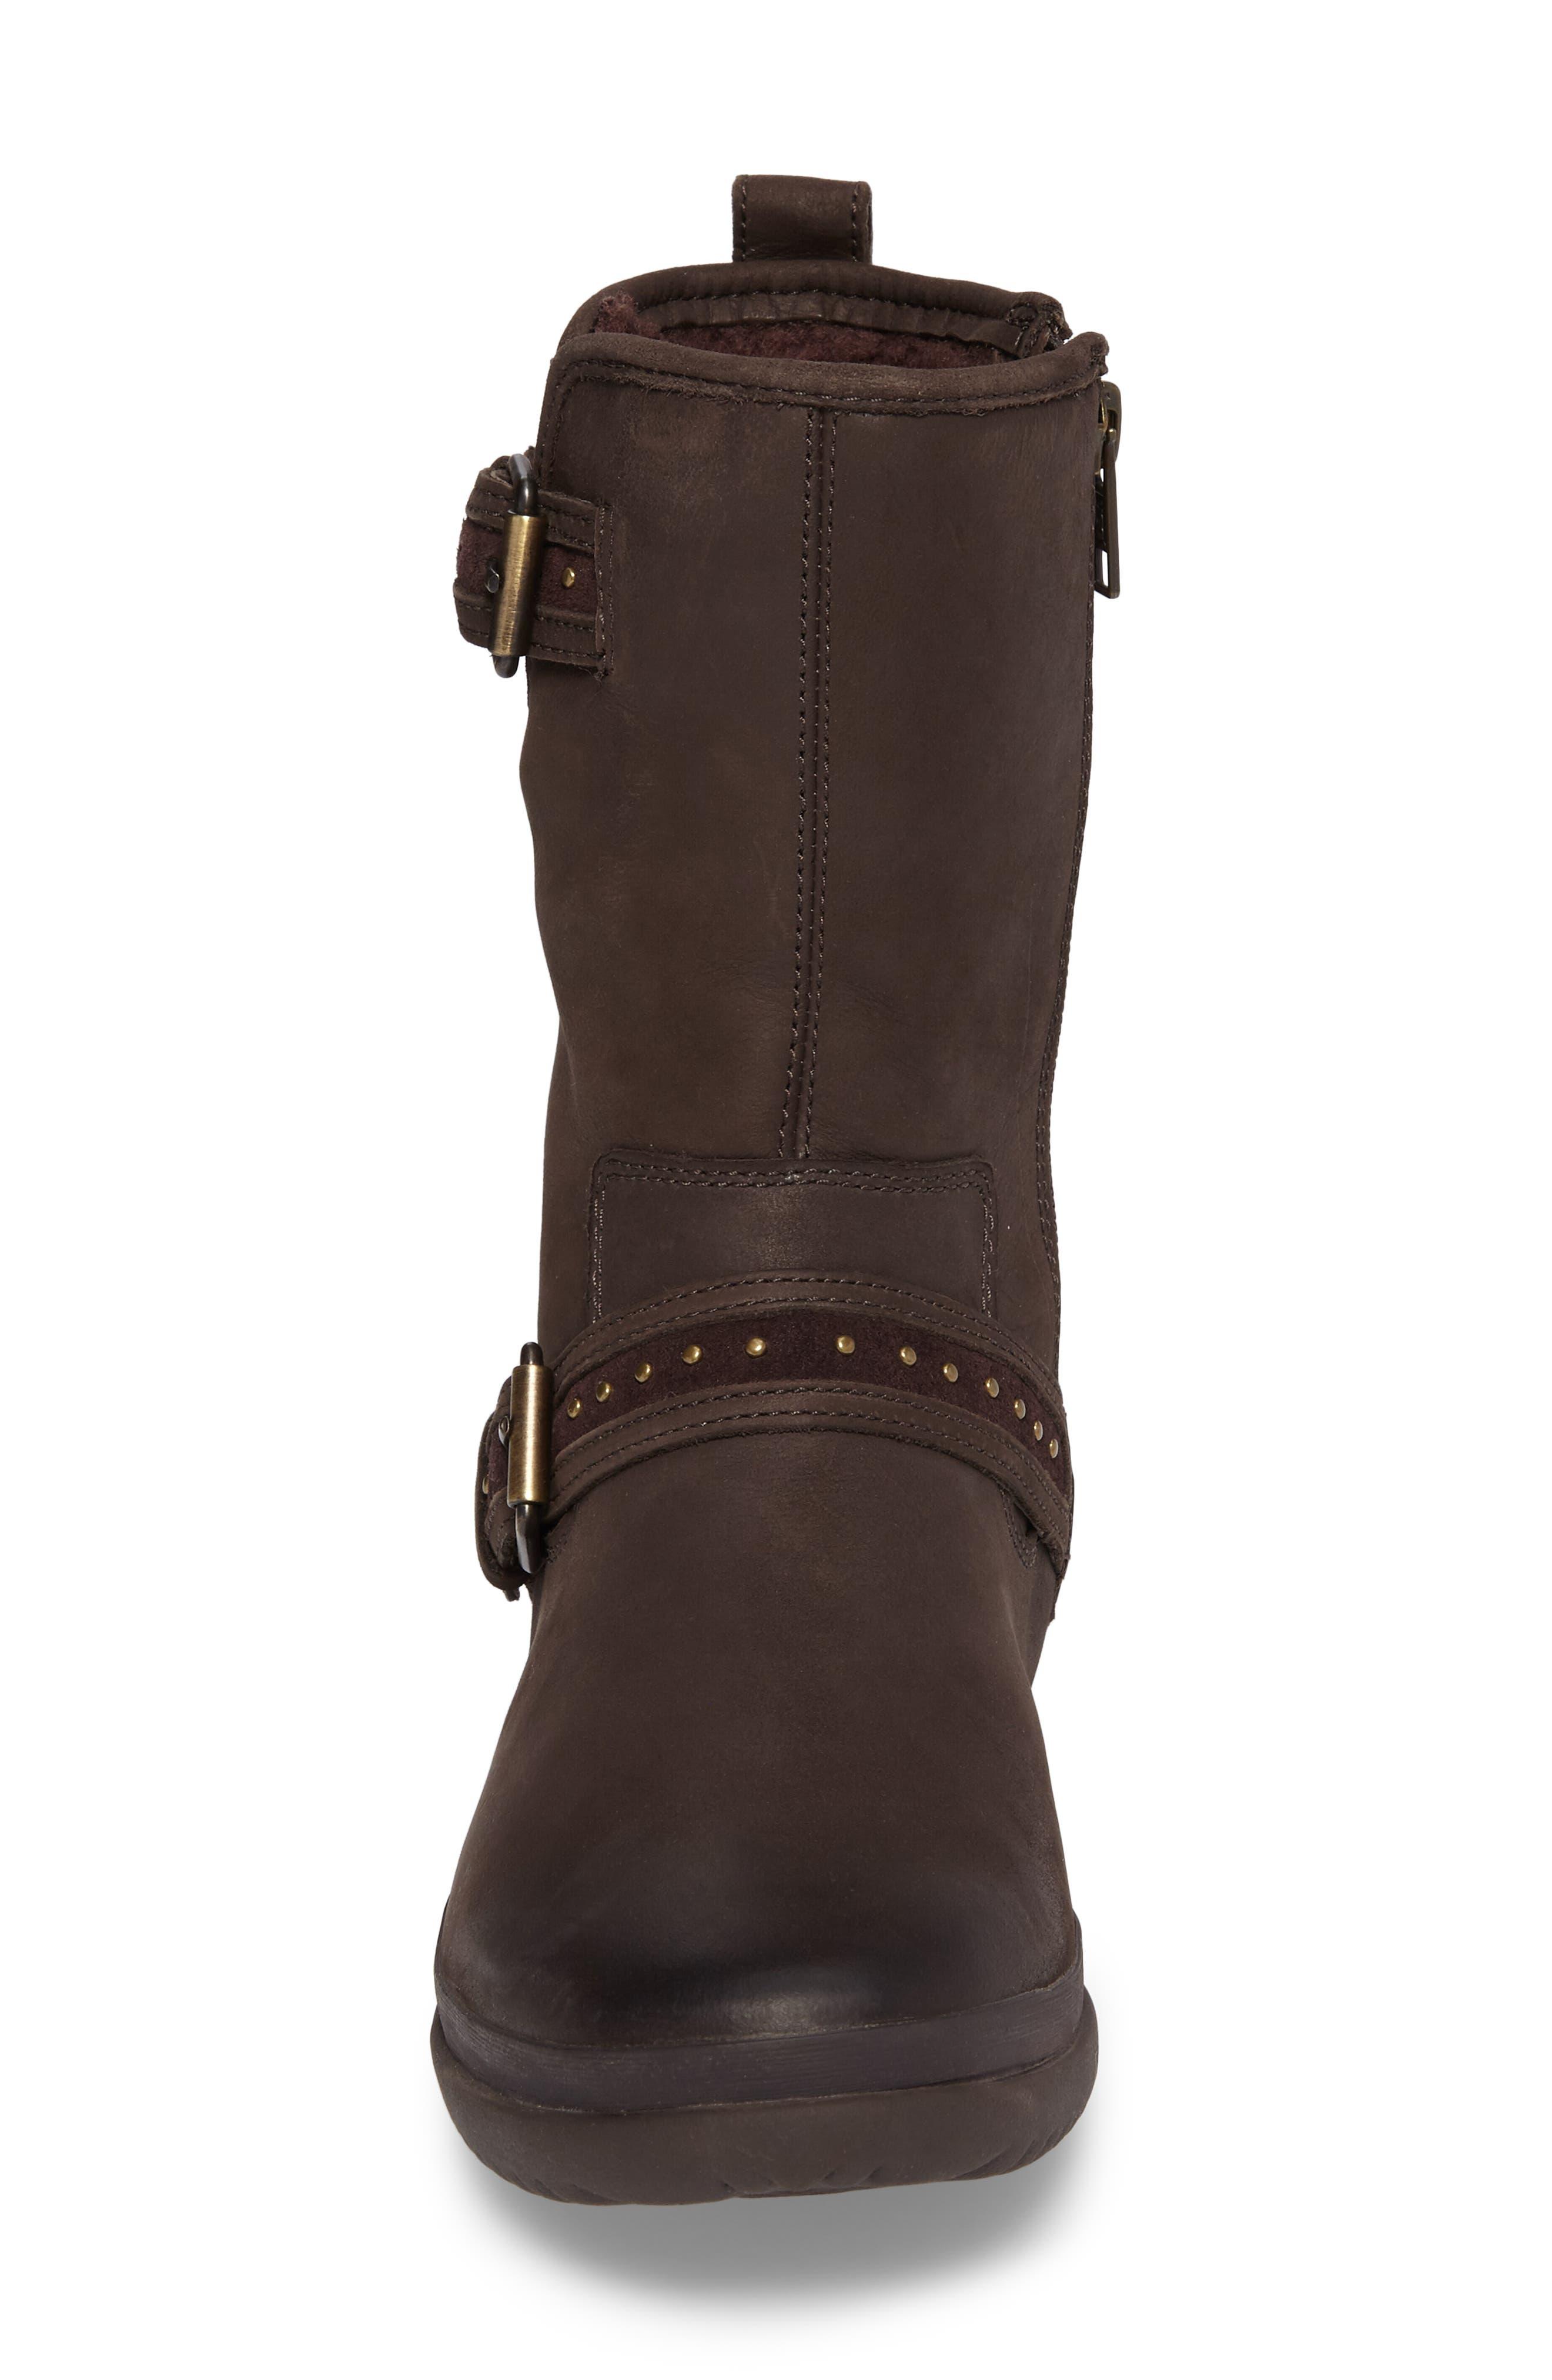 Jenise Waterproof Boot,                             Alternate thumbnail 4, color,                             Stout Leather